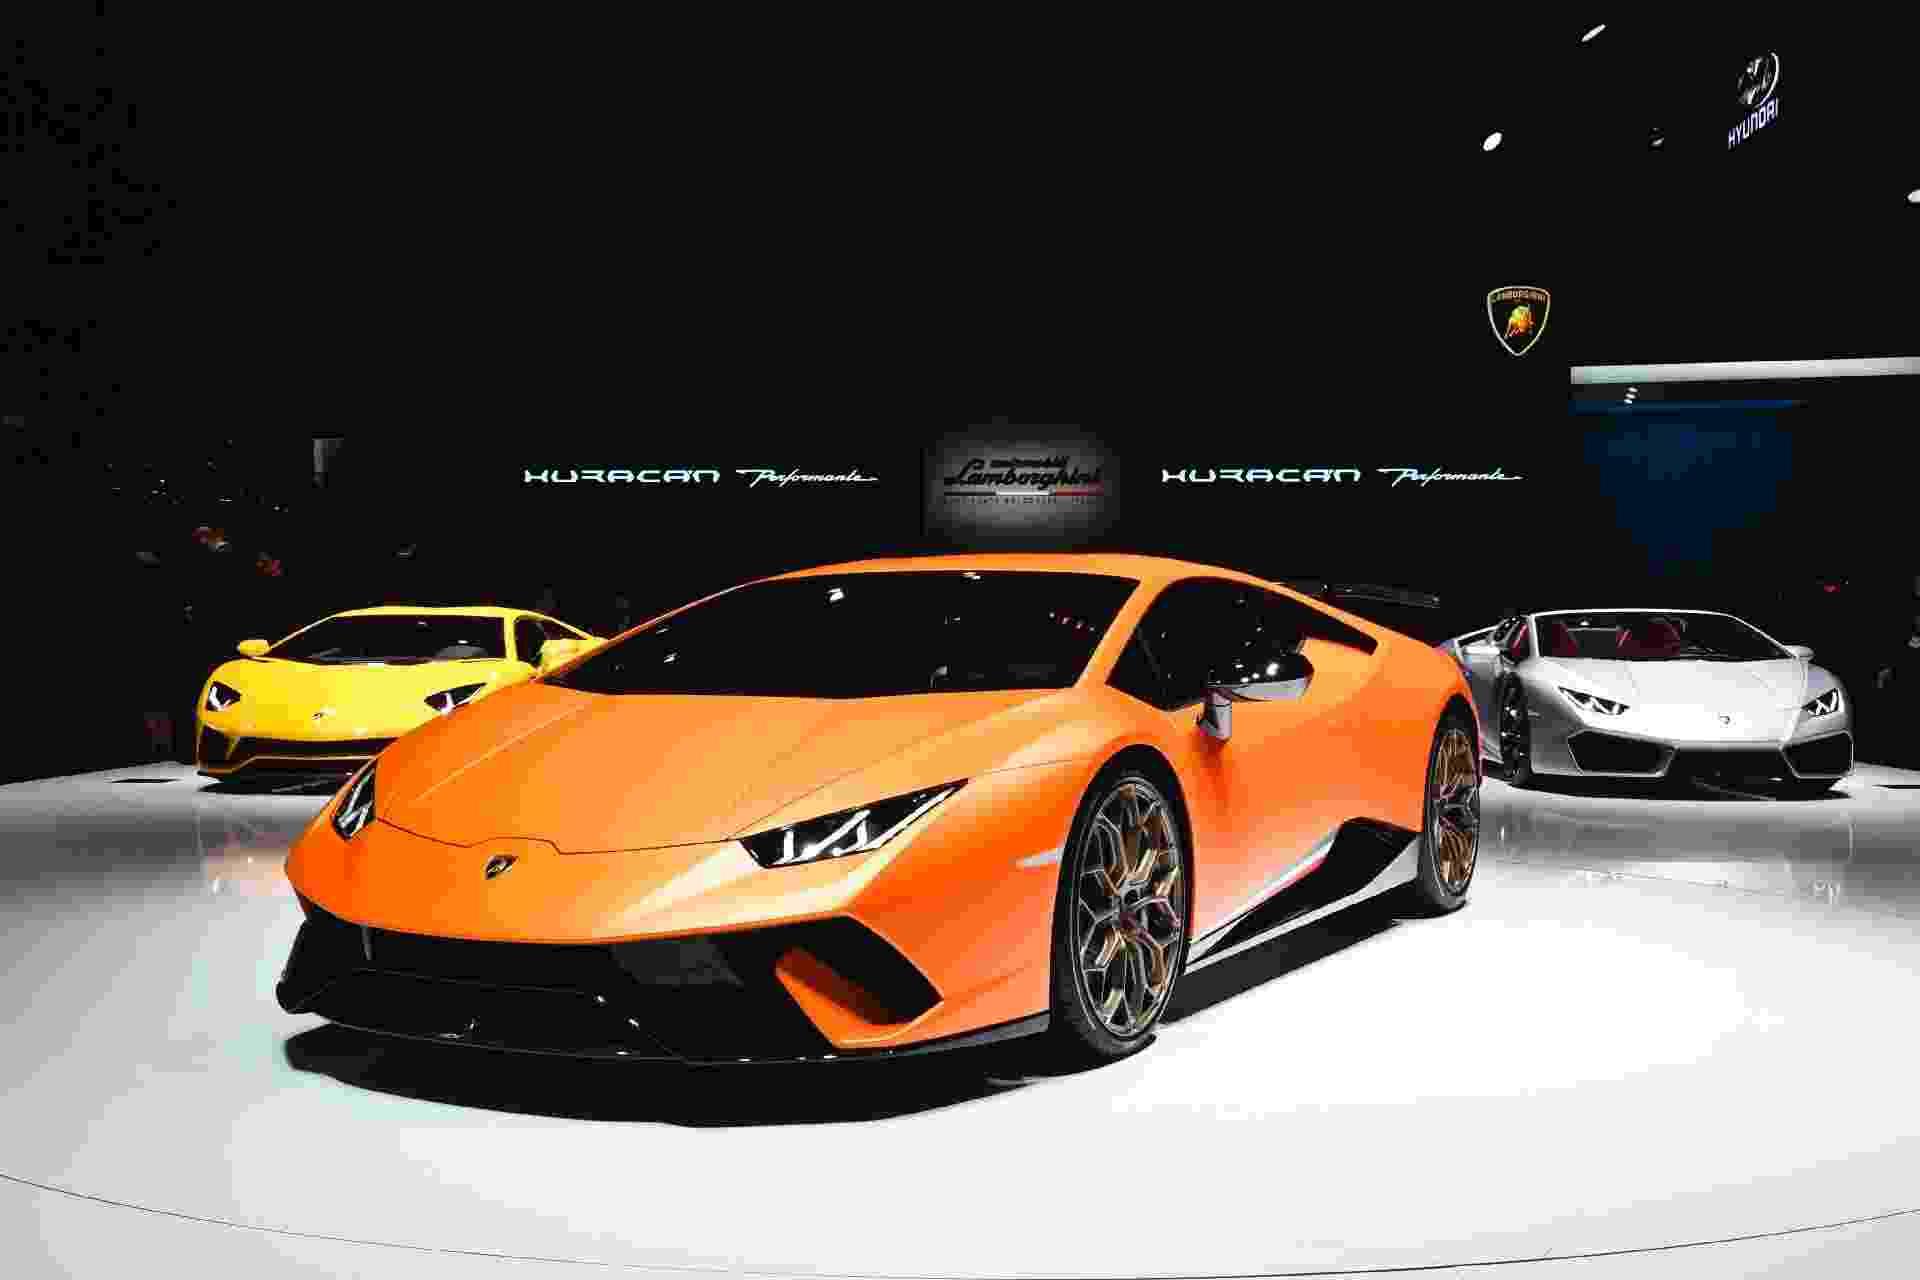 Lamborghini Huracán Performante - Alain Grosclaude/AFP